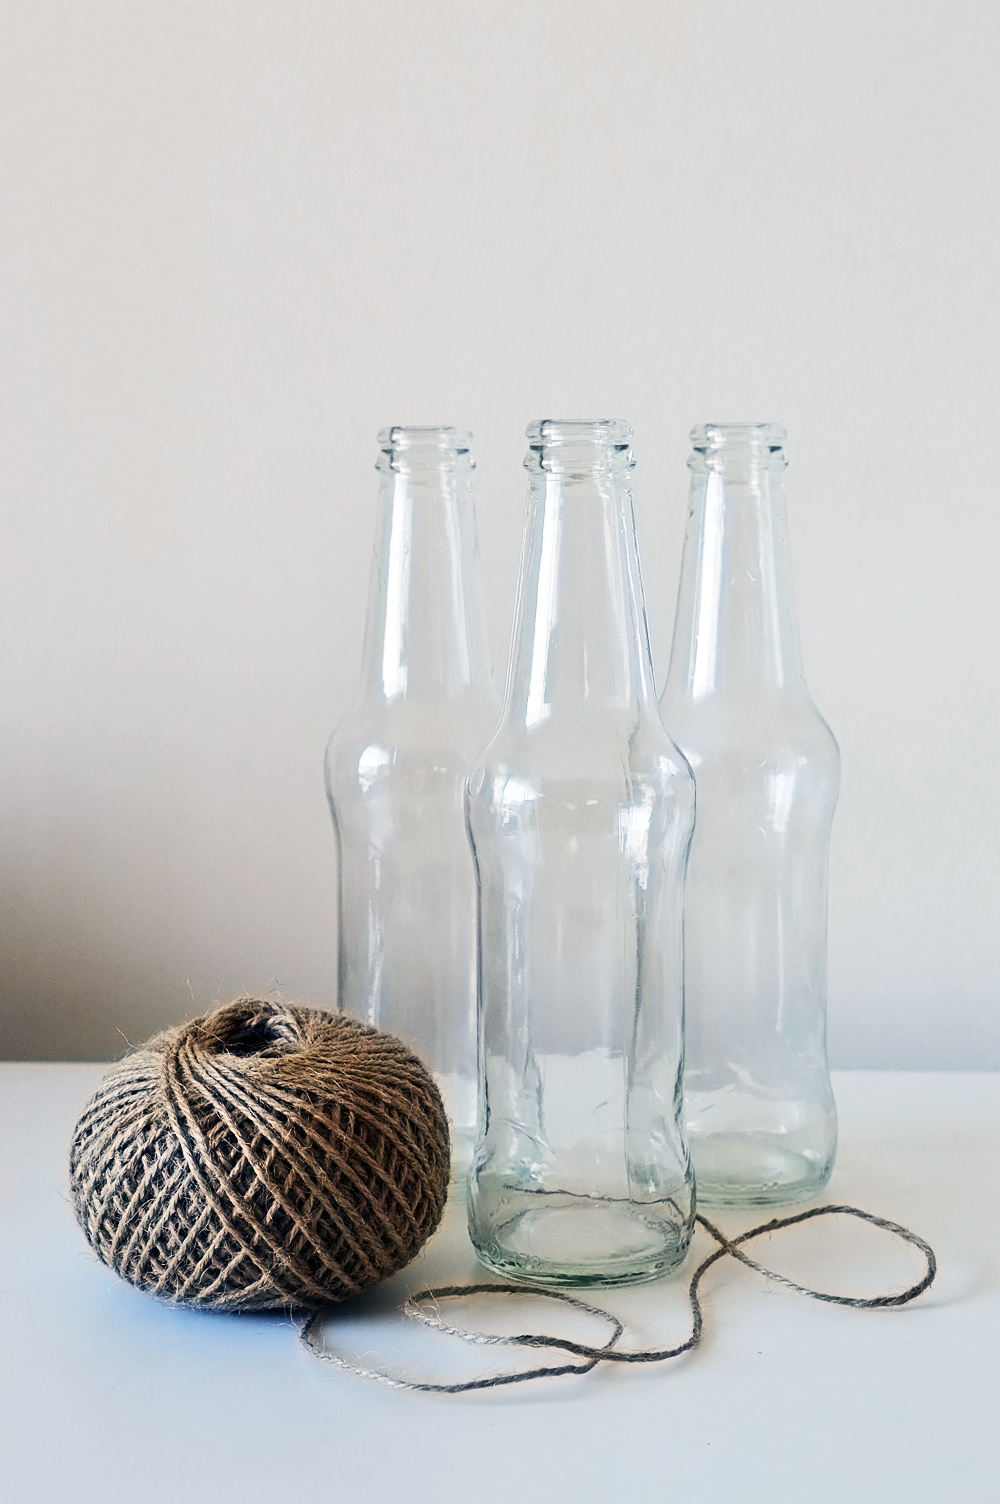 Knotted macrame bottle vases #DIY #macrame